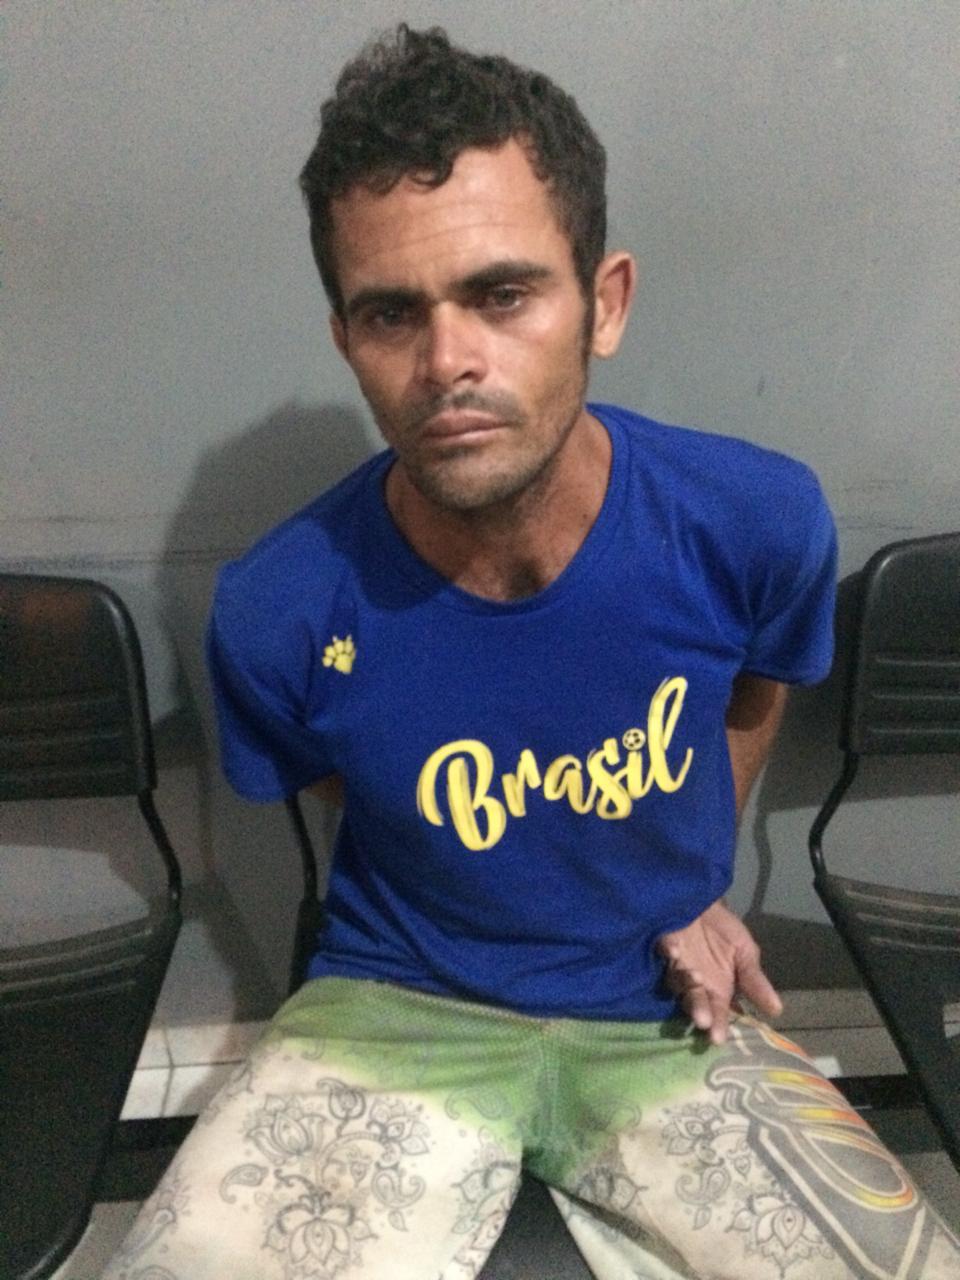 Suspeito preso por agressão (Foto: 7º BPM)